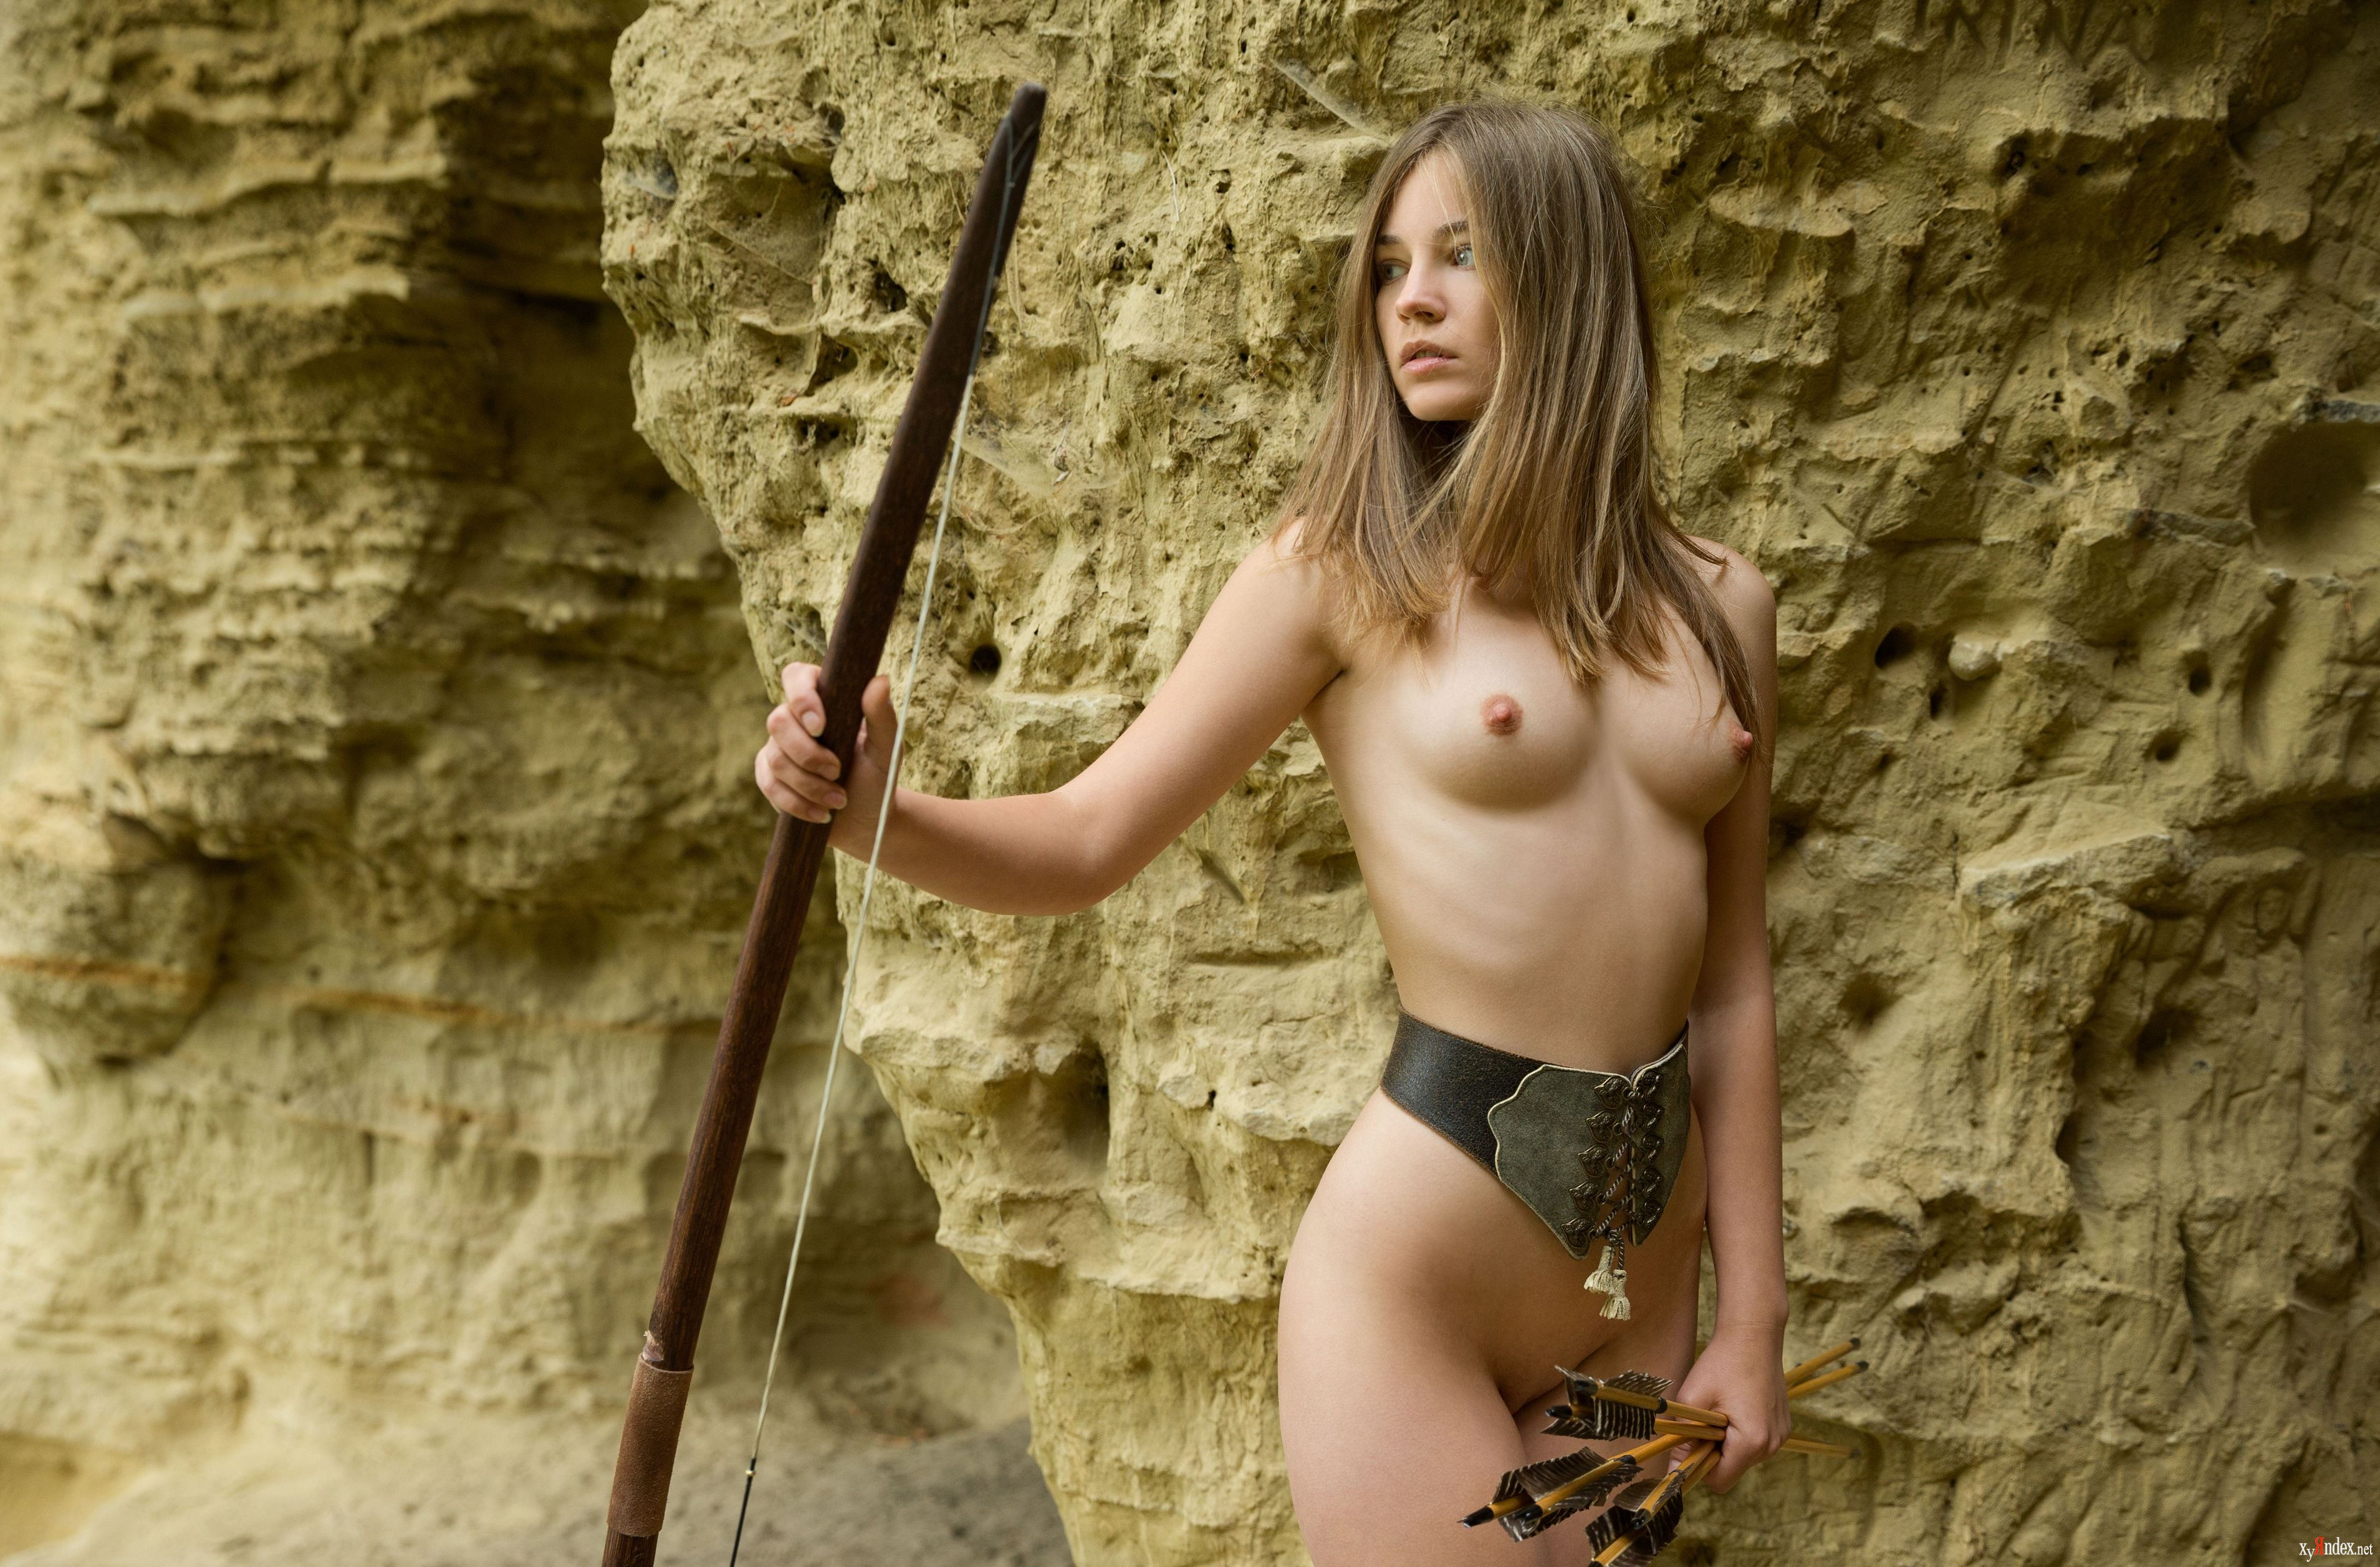 Young naked girls hunting, alena hemkova nude fucking